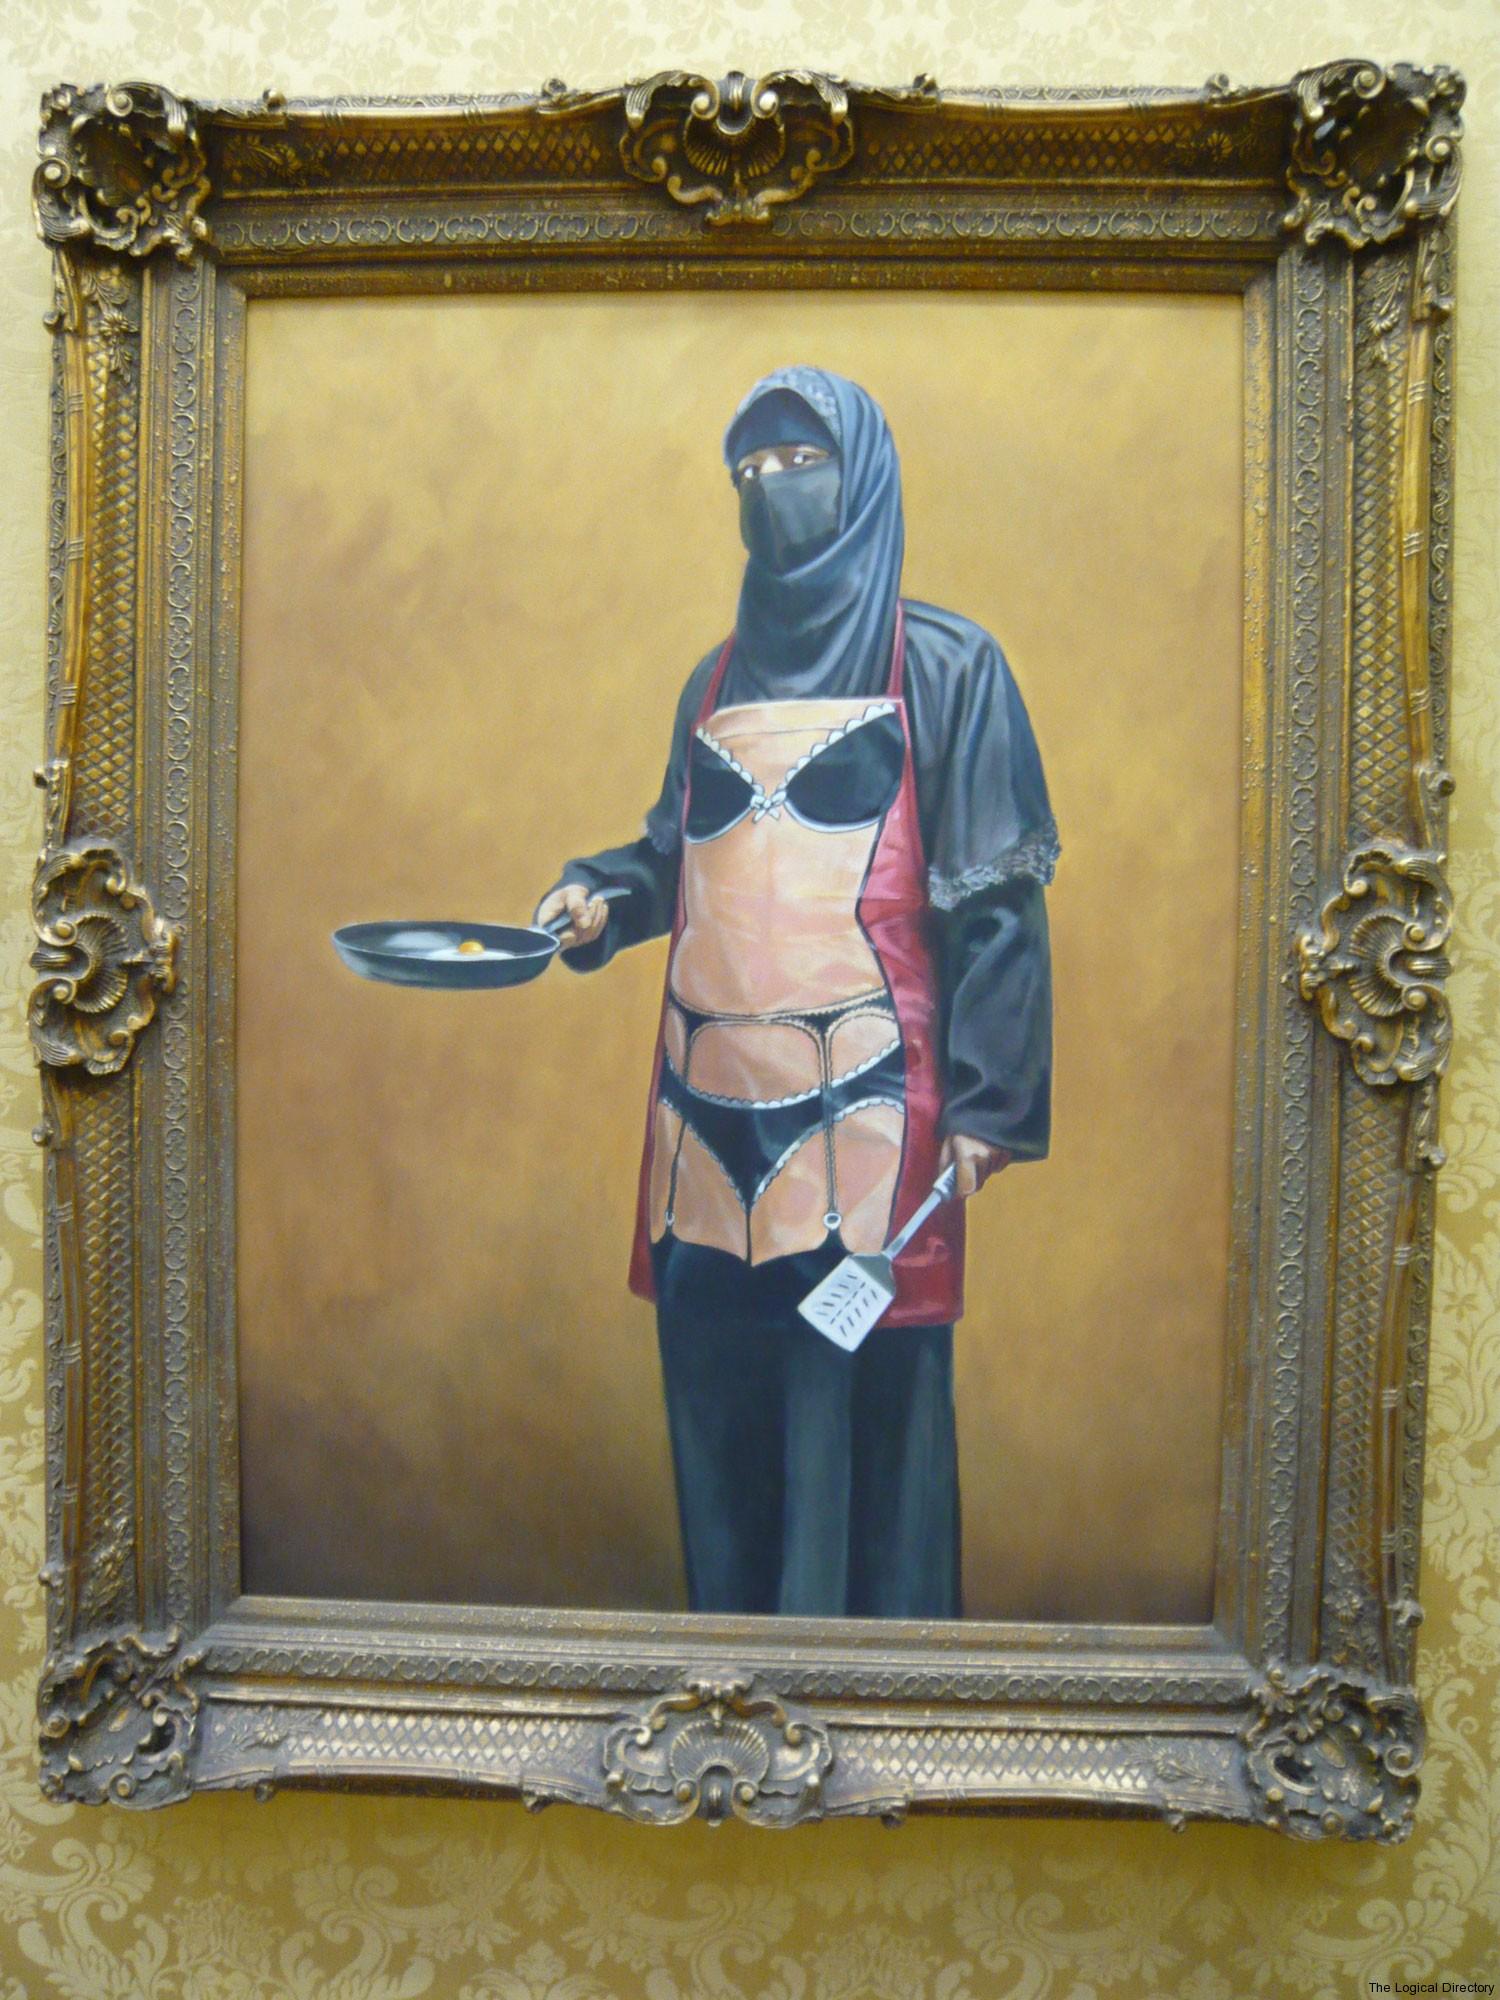 Banksy - Burlesque Burka Apron